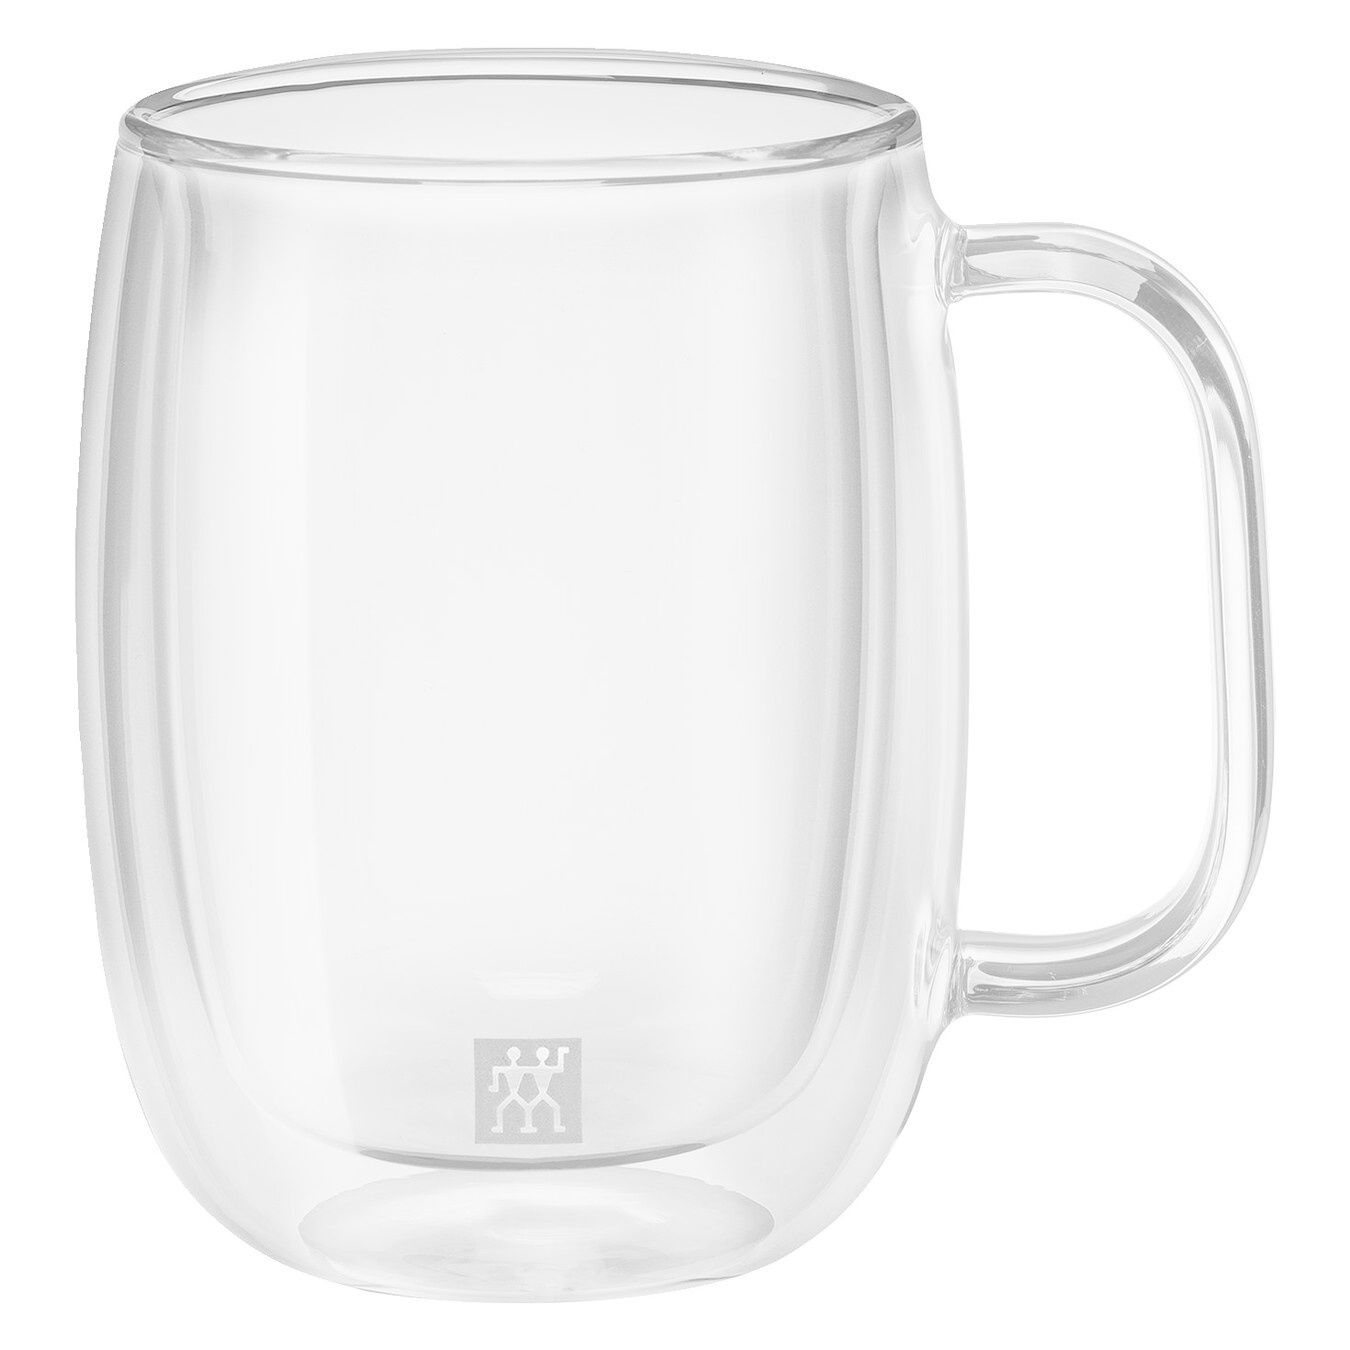 Sorrento Plus 2-Piece Glass Coffee Mug Set 355ml